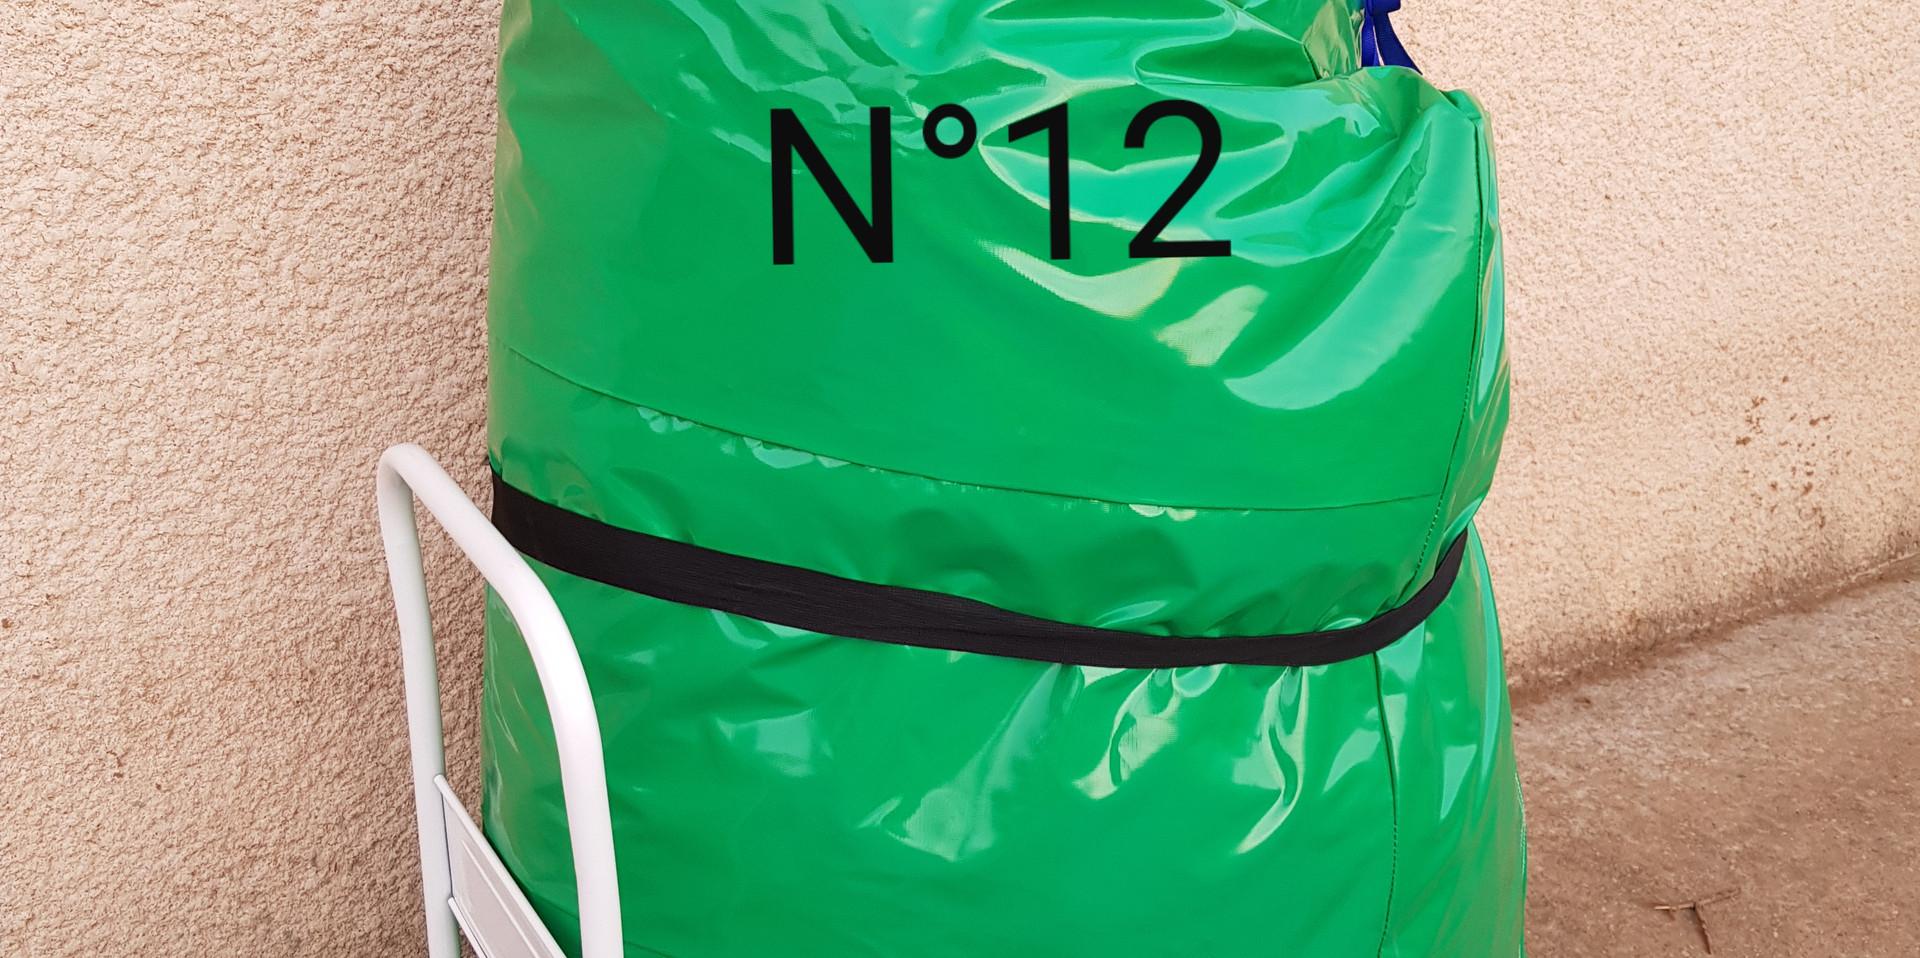 Structure N°12 (conditionnement)